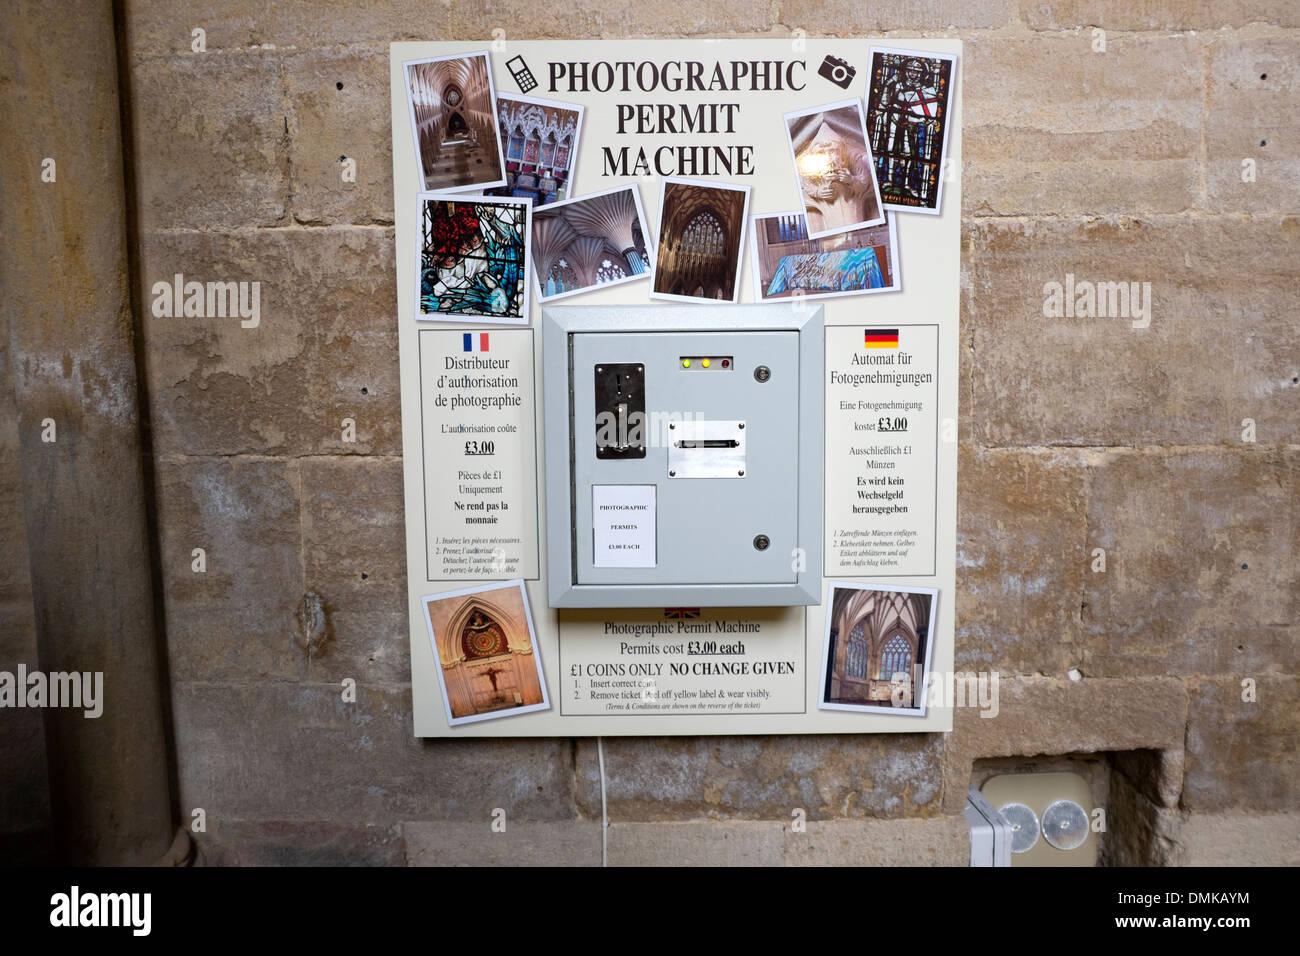 Photographic Permit Machine Permission to Photograph Stock Photo